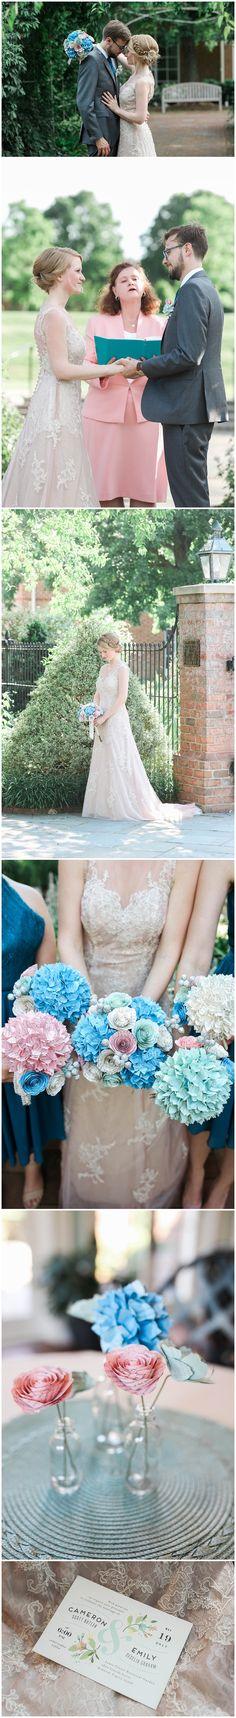 Emily + Cameron - Lewis Ginter Botanical Garden - Richmond Wedding